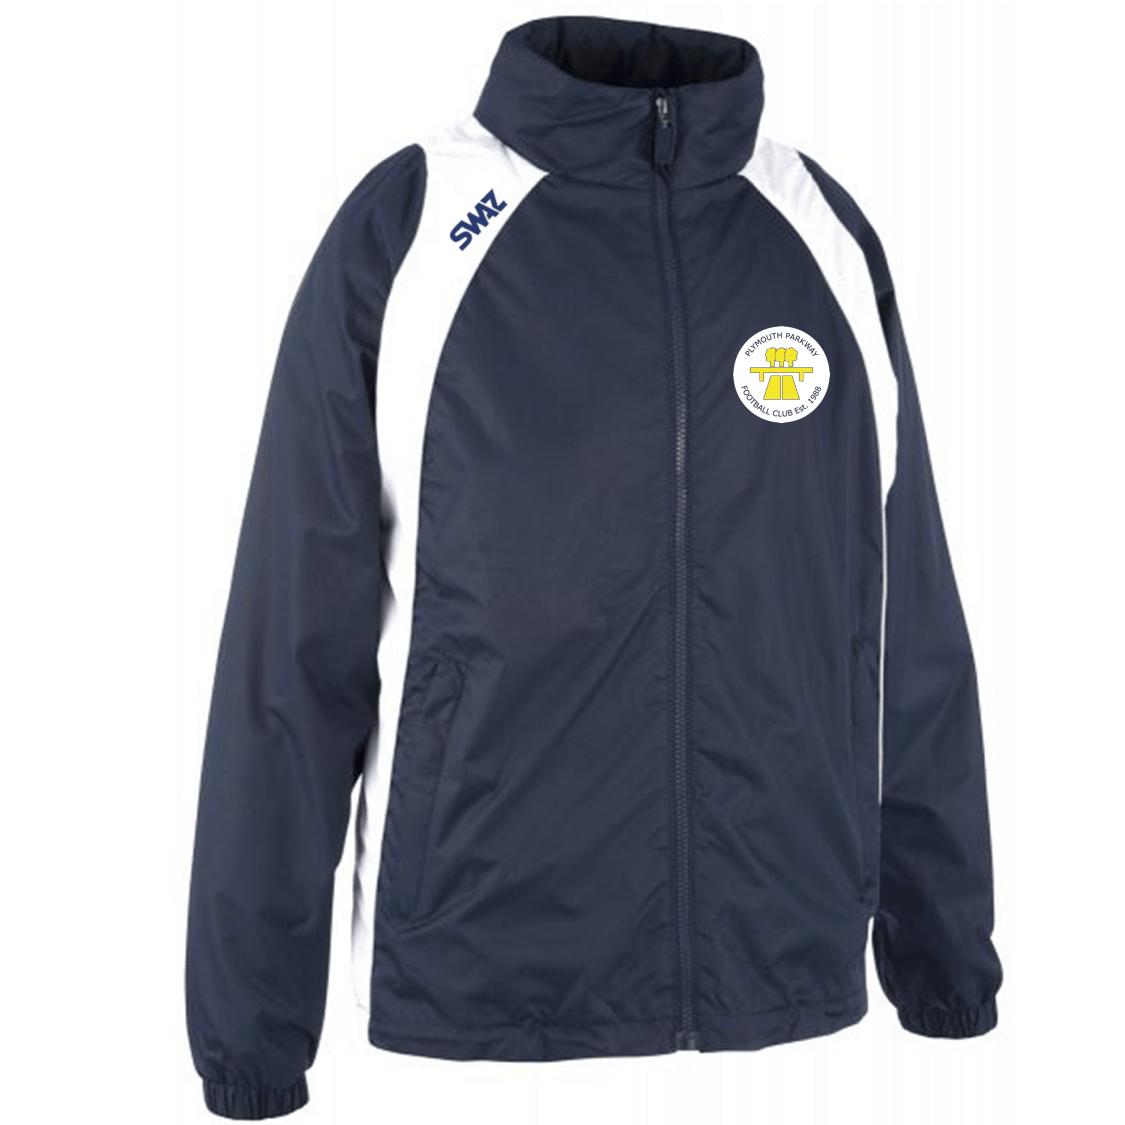 Plymouth Parkway Showerproof Jacket   SWAZ Teamwear   Football Kits